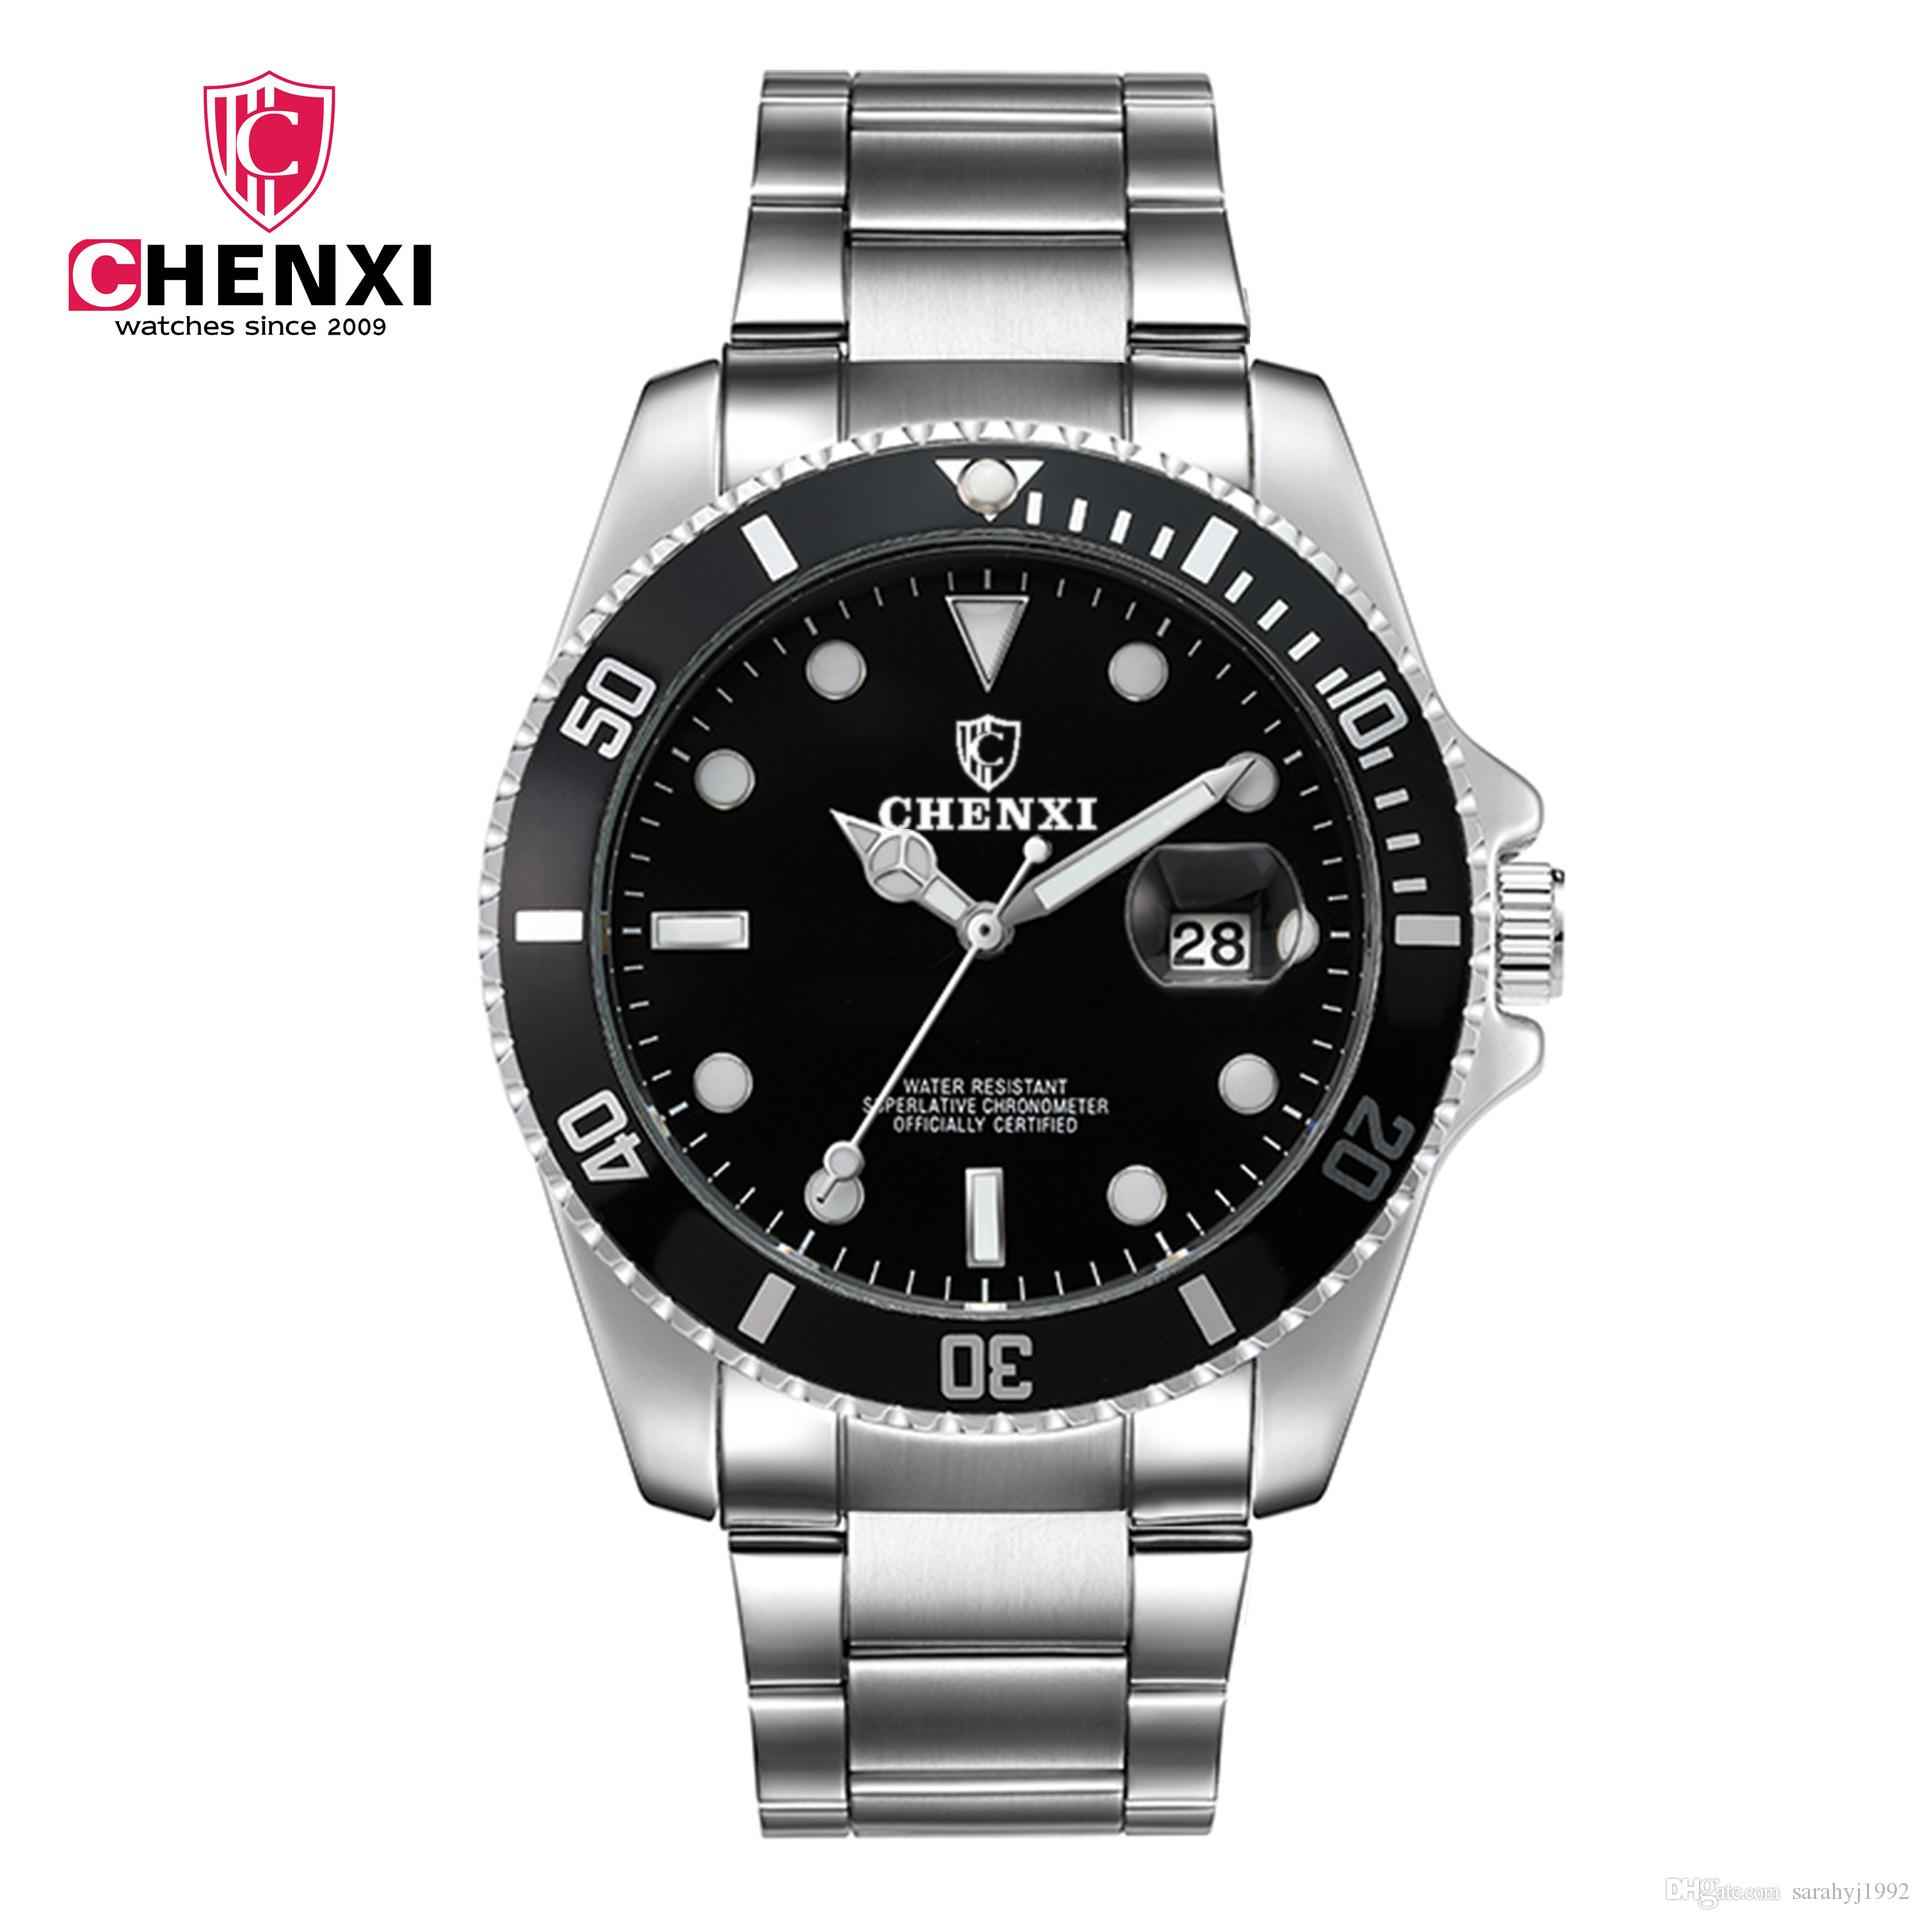 6becaeec5 CHENXI Waterproof Watches Strap Men 's Watch 30M Waterproof Luminous ...